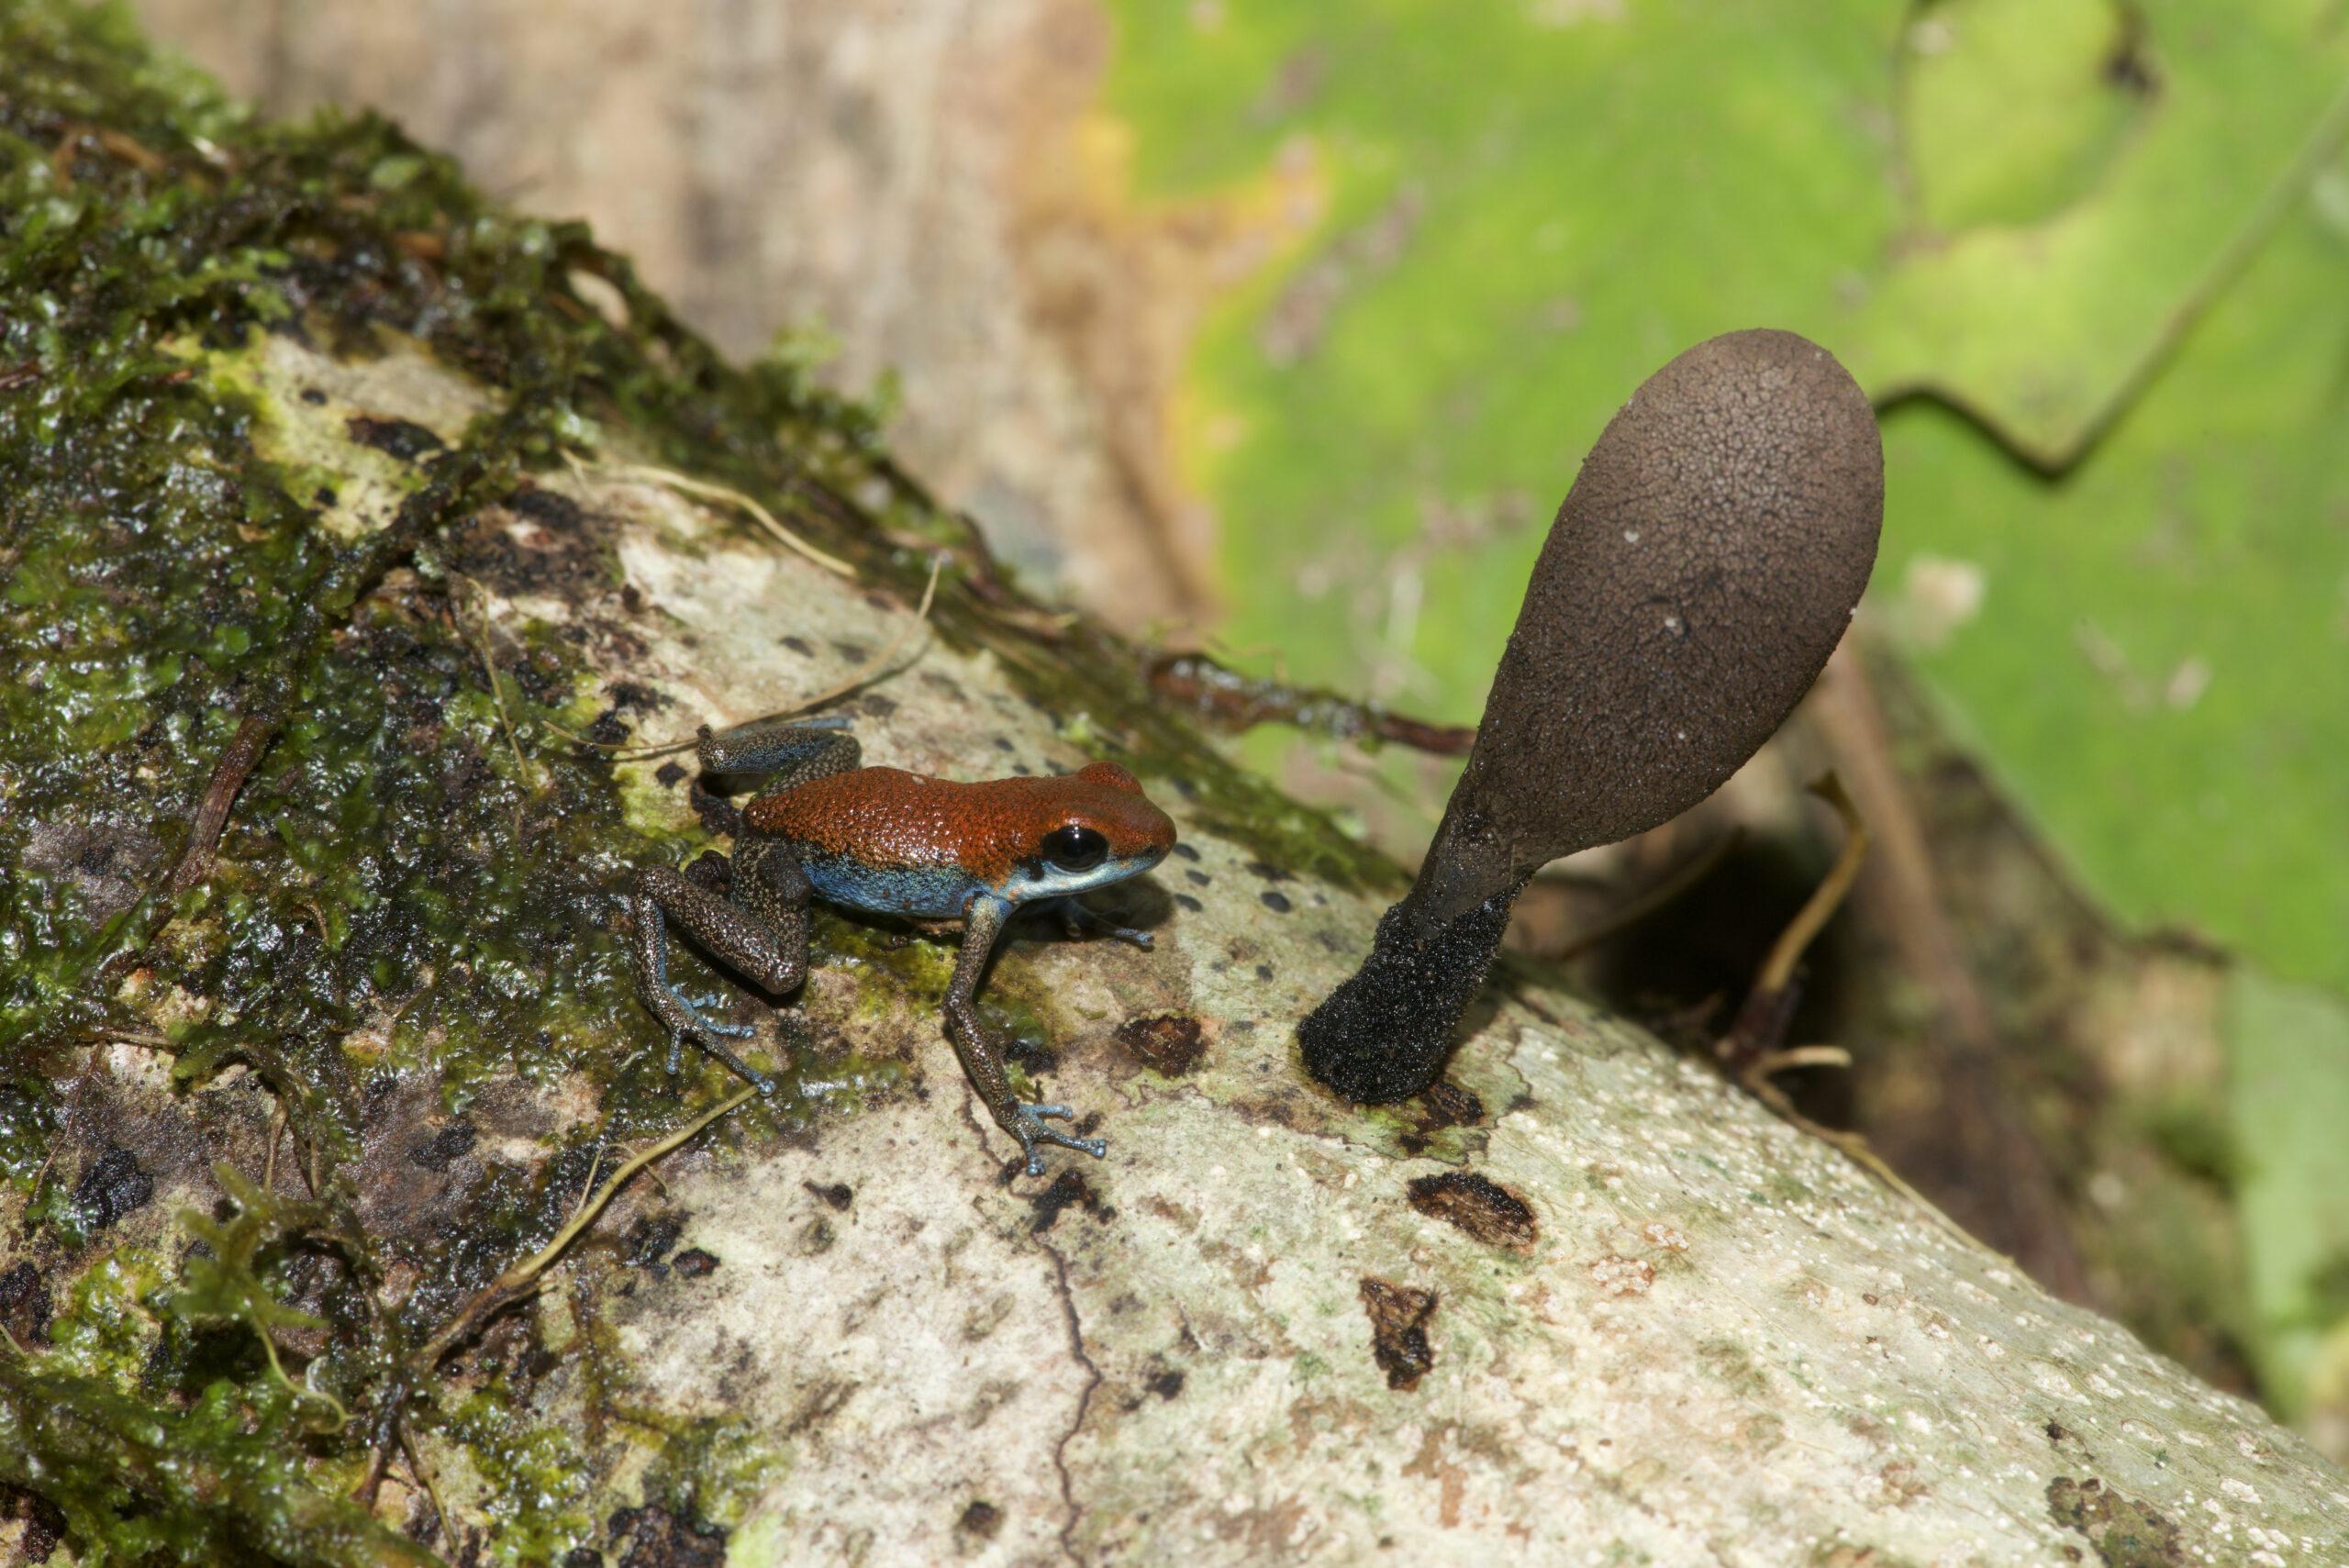 Oophaga pumilio from Kusapin Peninsula, Bocas del Toro, Panama - by E. Van Heygen.